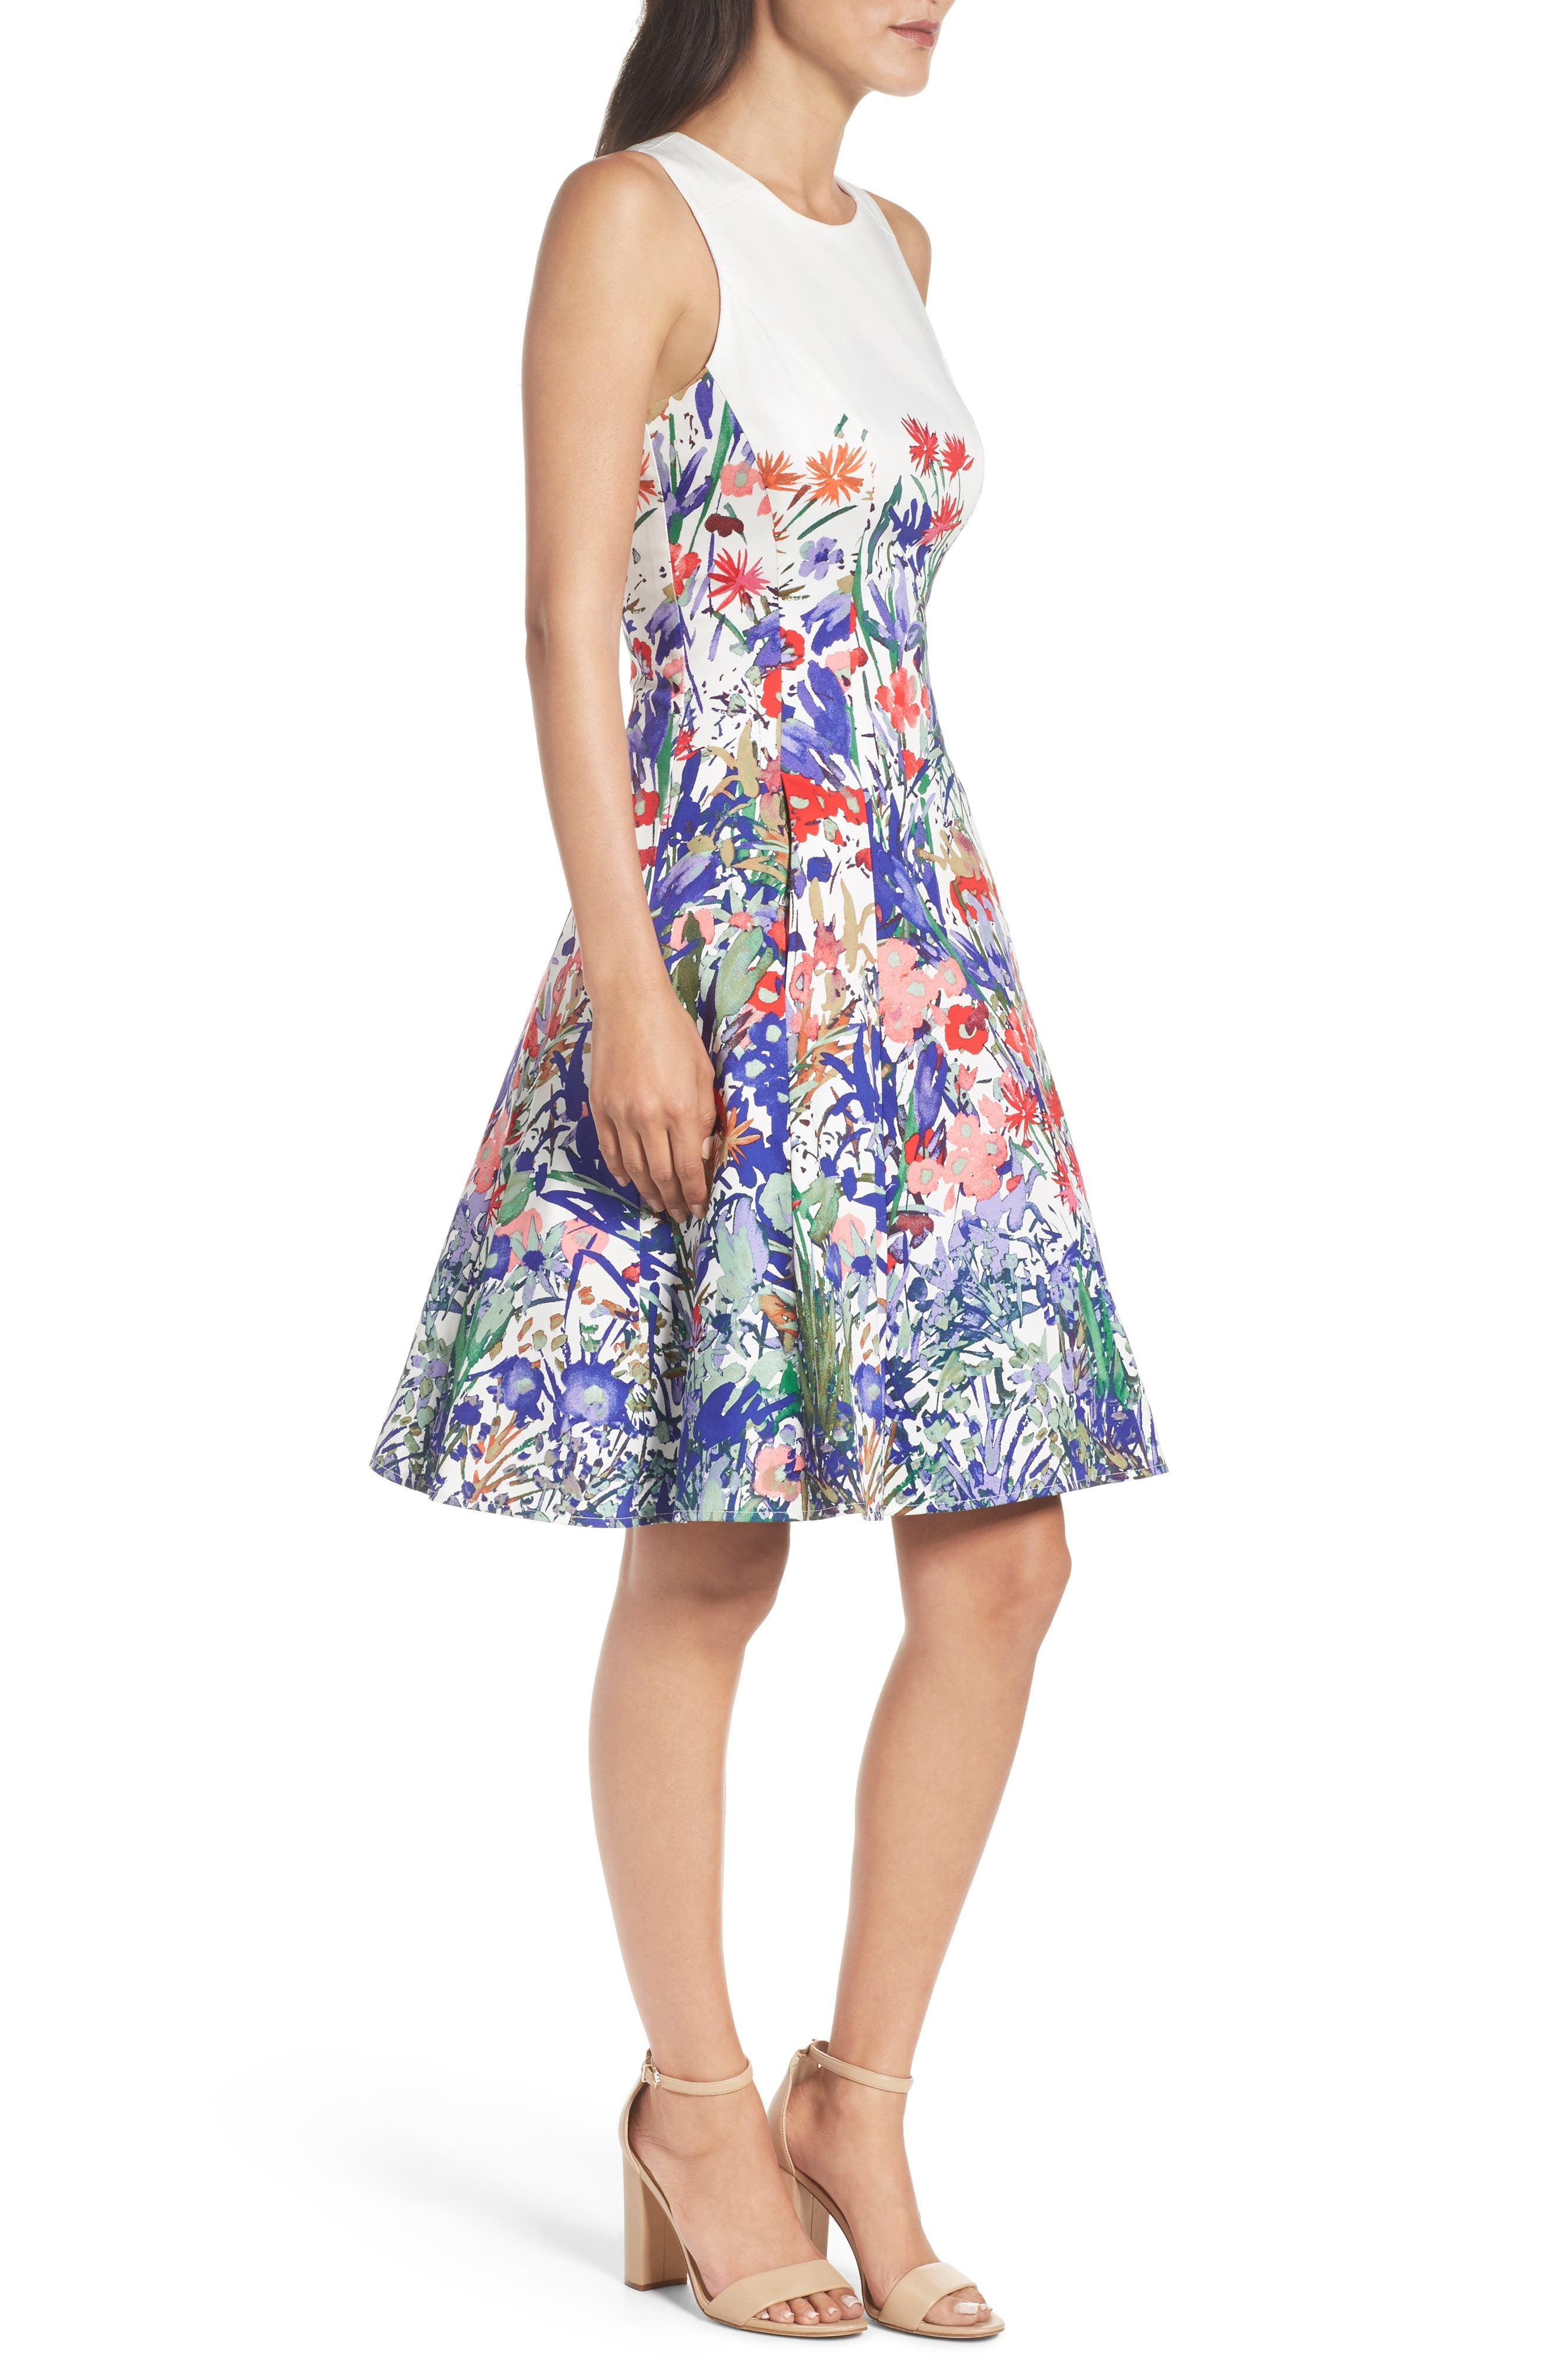 Cottage Garden Fit & Flare Dress,                             Alternate thumbnail 3, color,                             Soft White/ Coral/ Purple